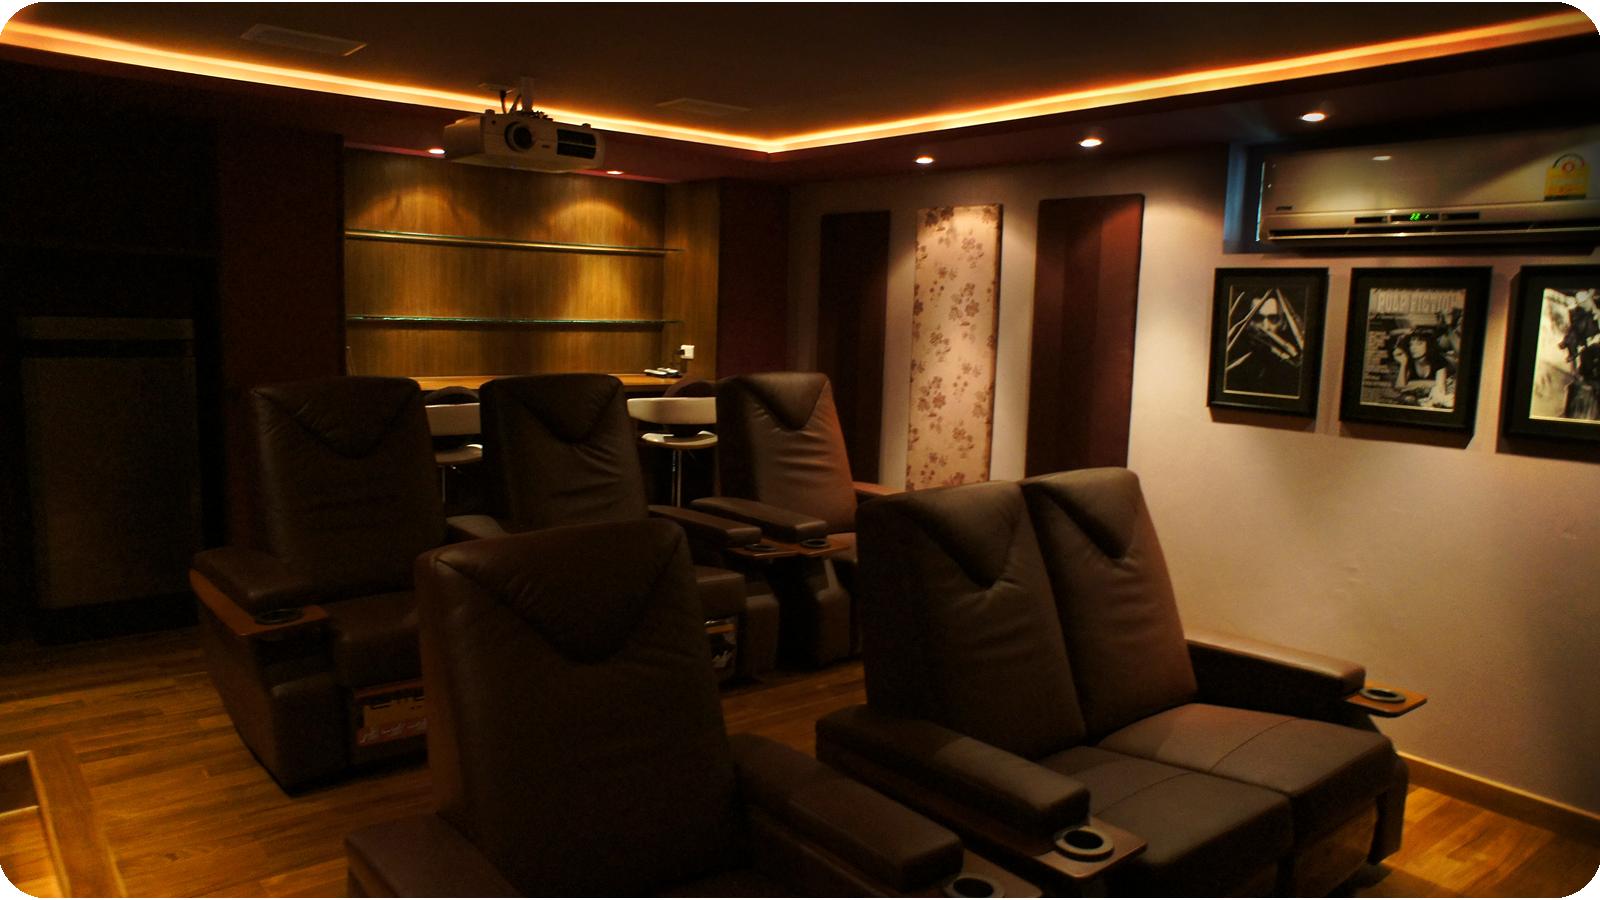 Rear view of eventual Home Cinema